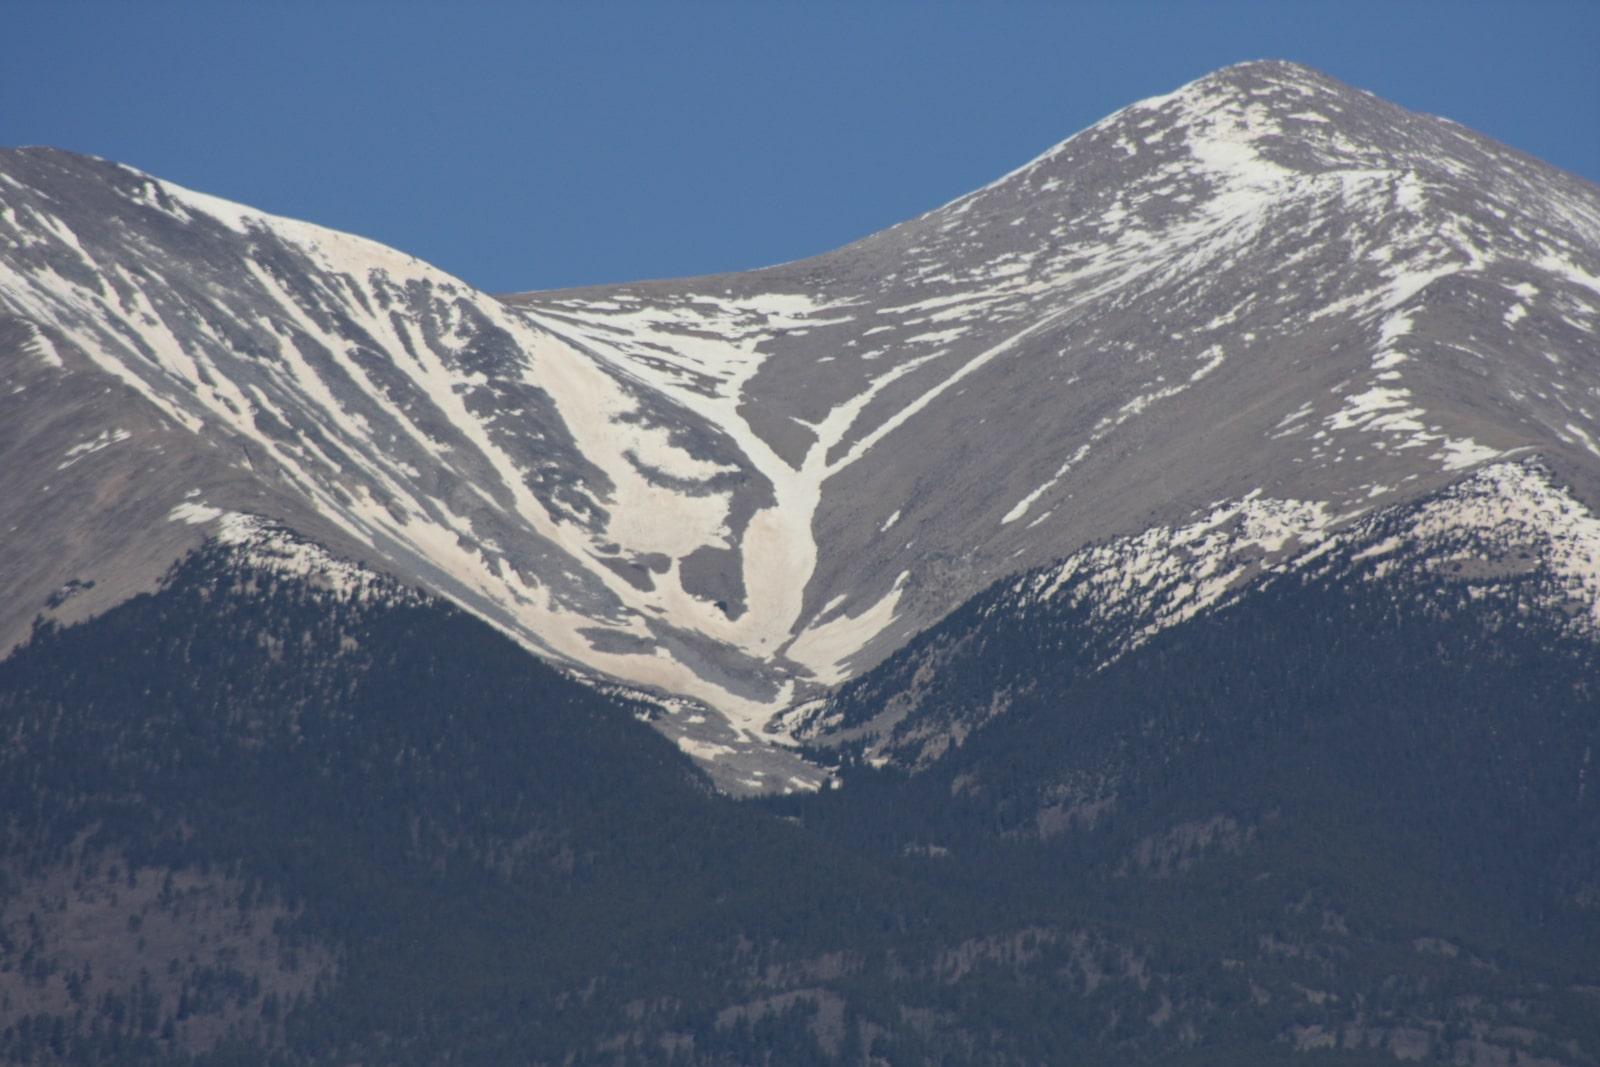 Mount Shavano Angel and Grinch